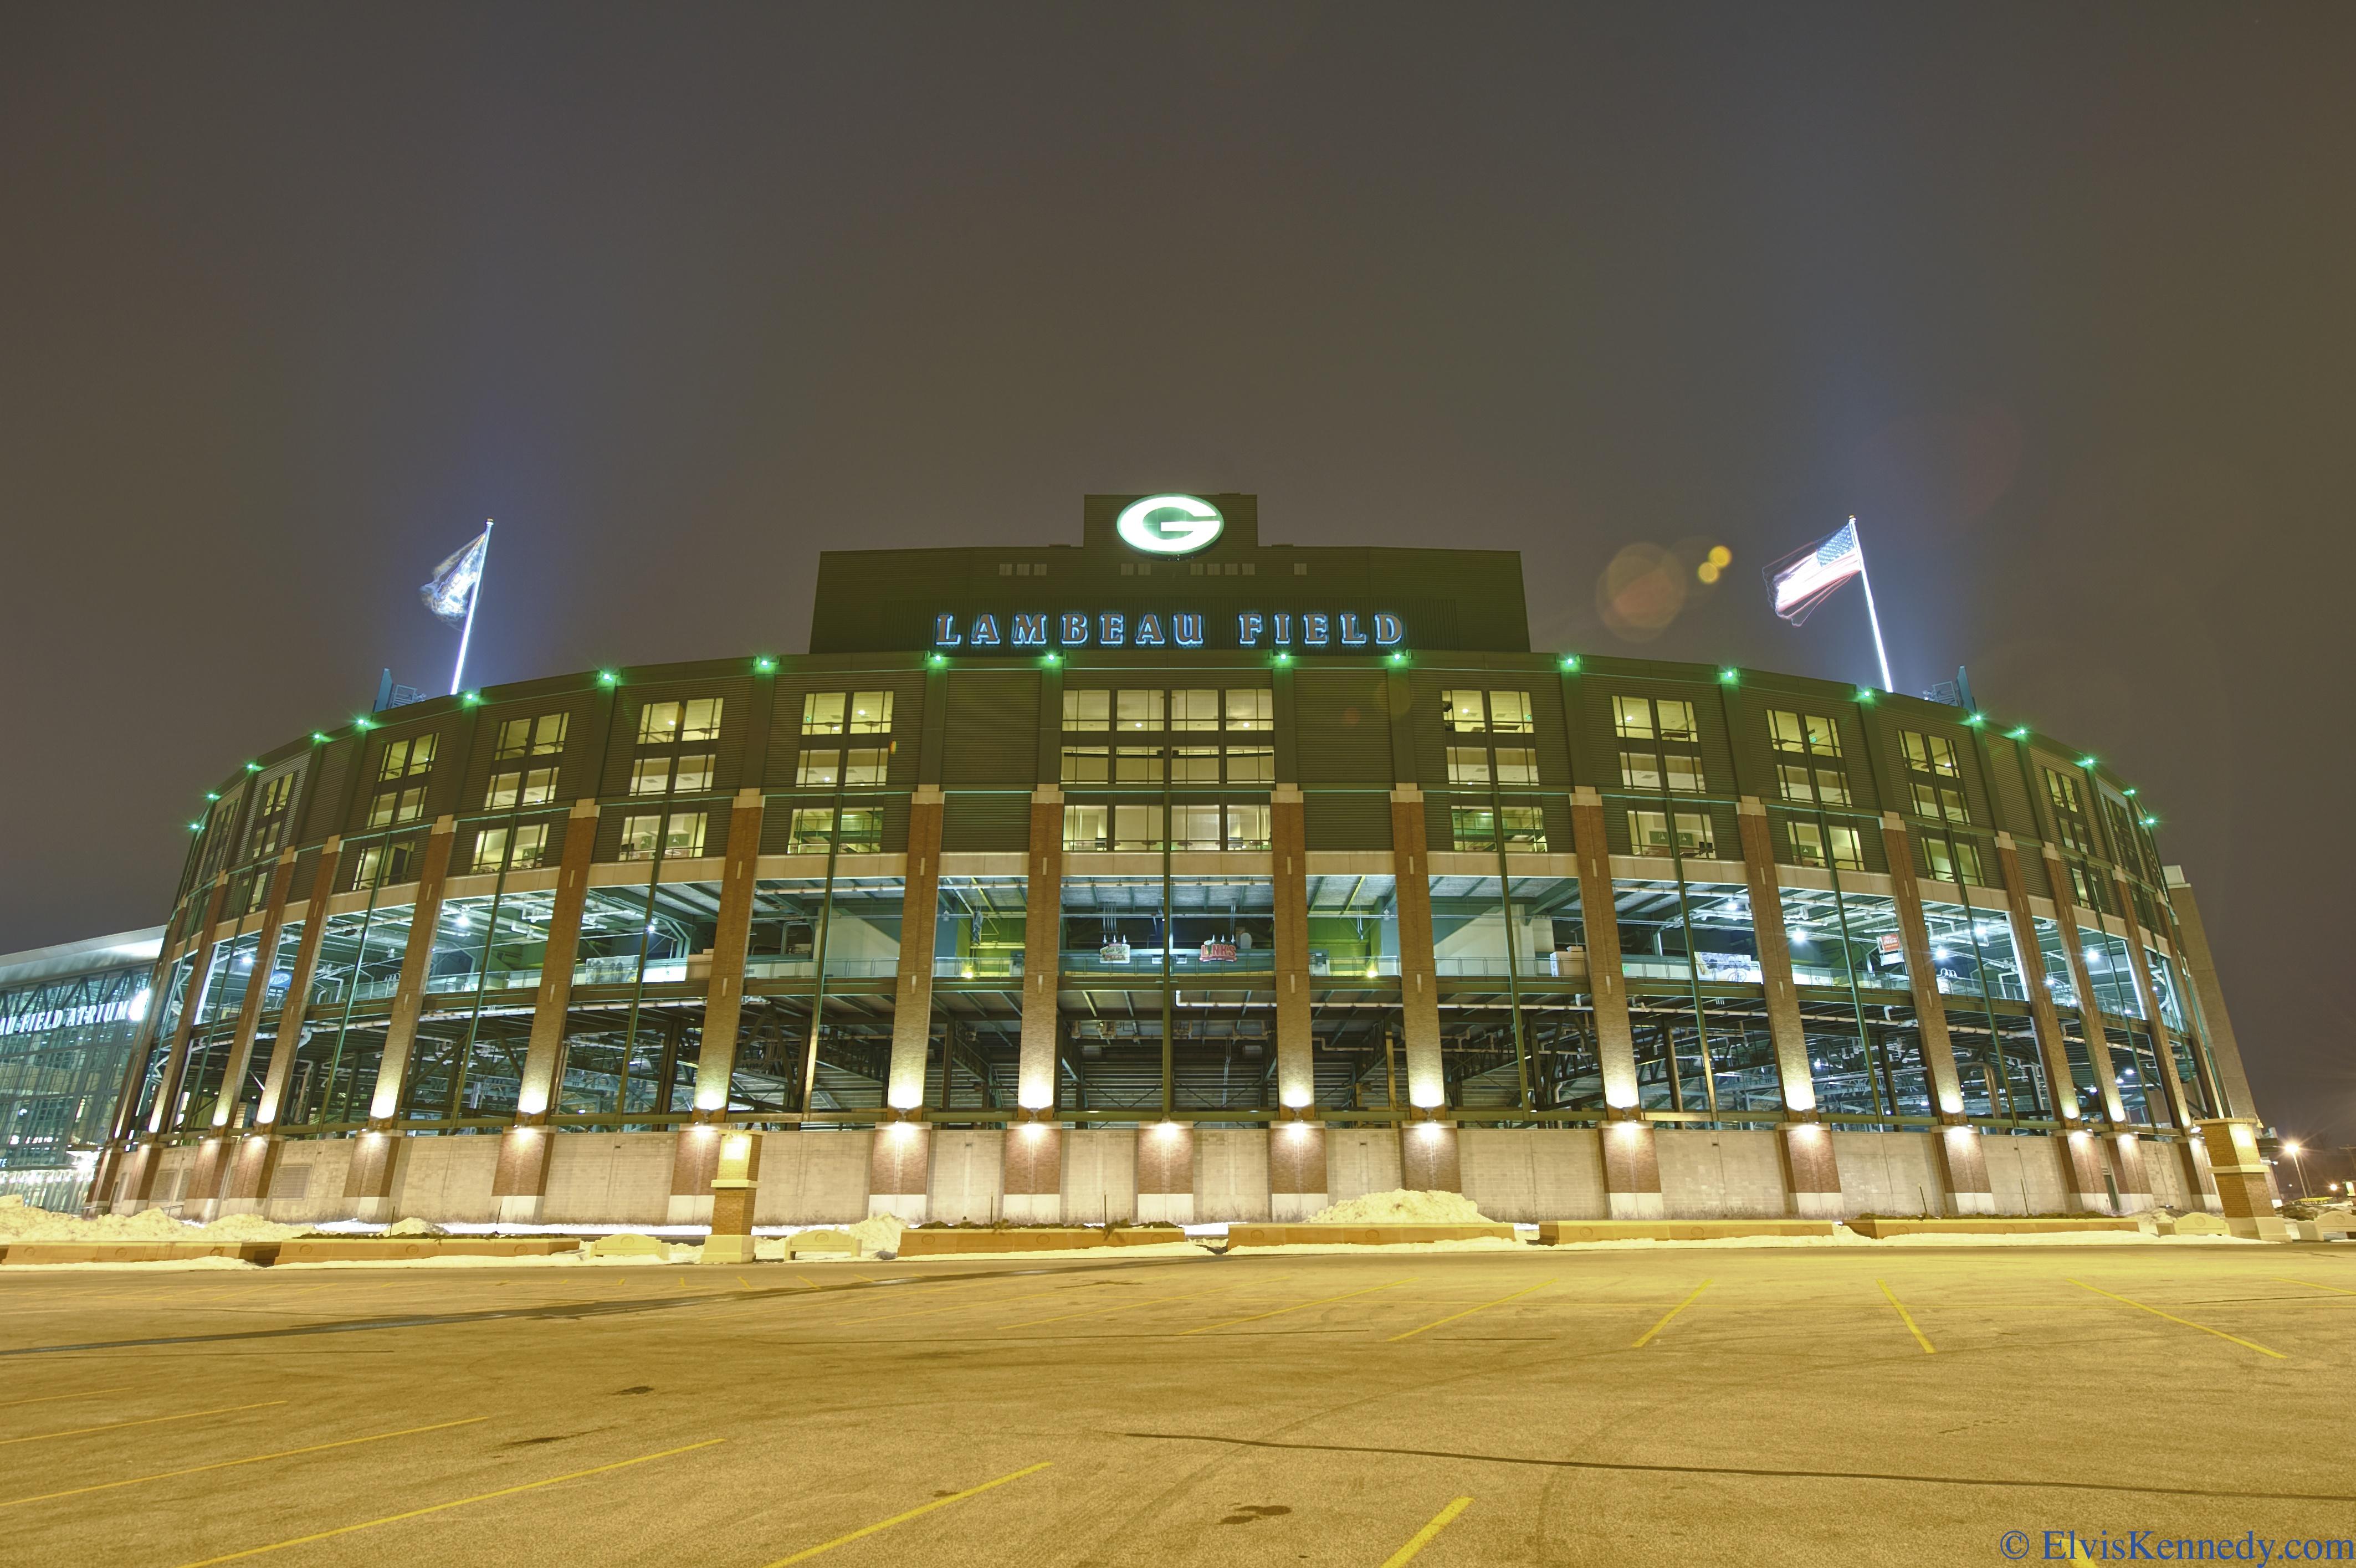 Green Bay Packers Wallpaper Hd Lambeau Field In Hdr Flickr Photo Sharing